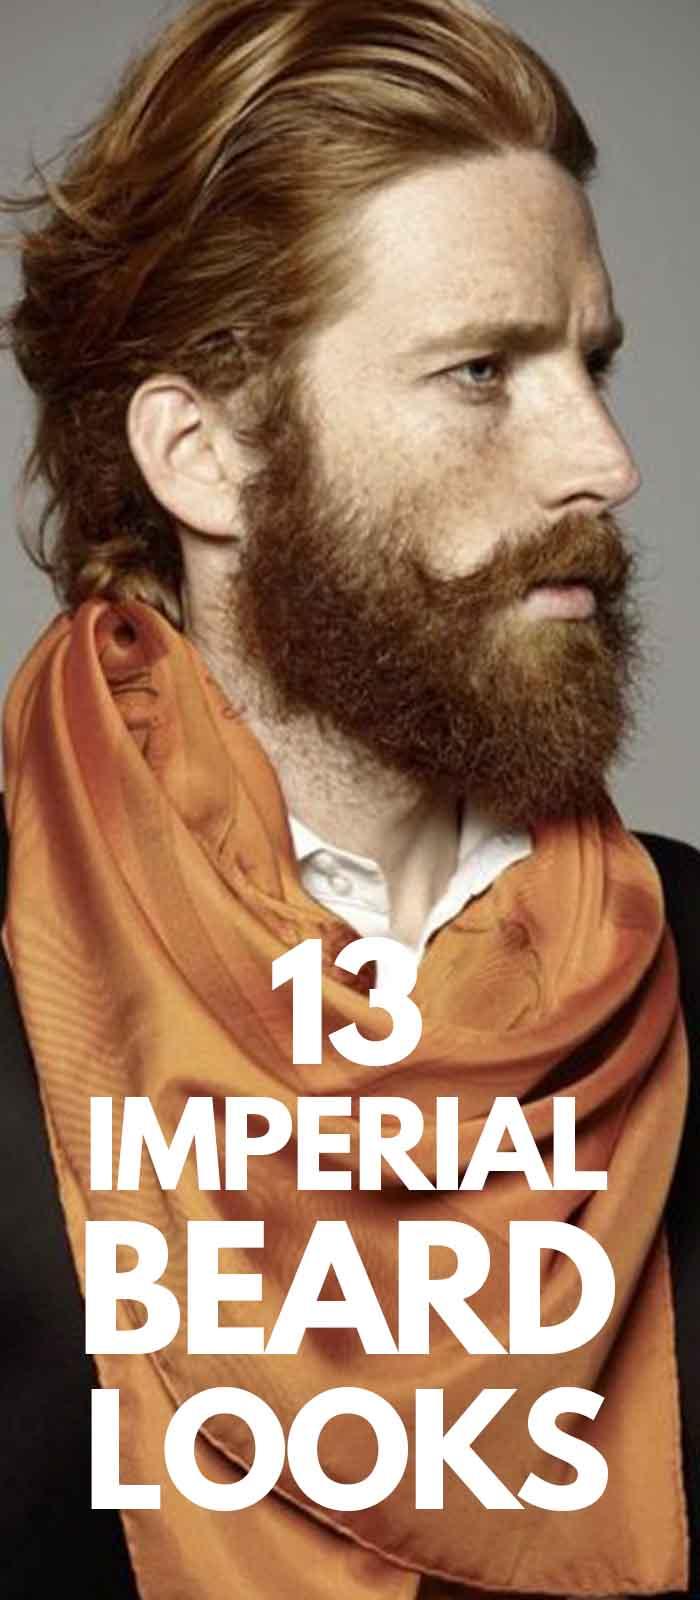 Imperial Beard look for men!